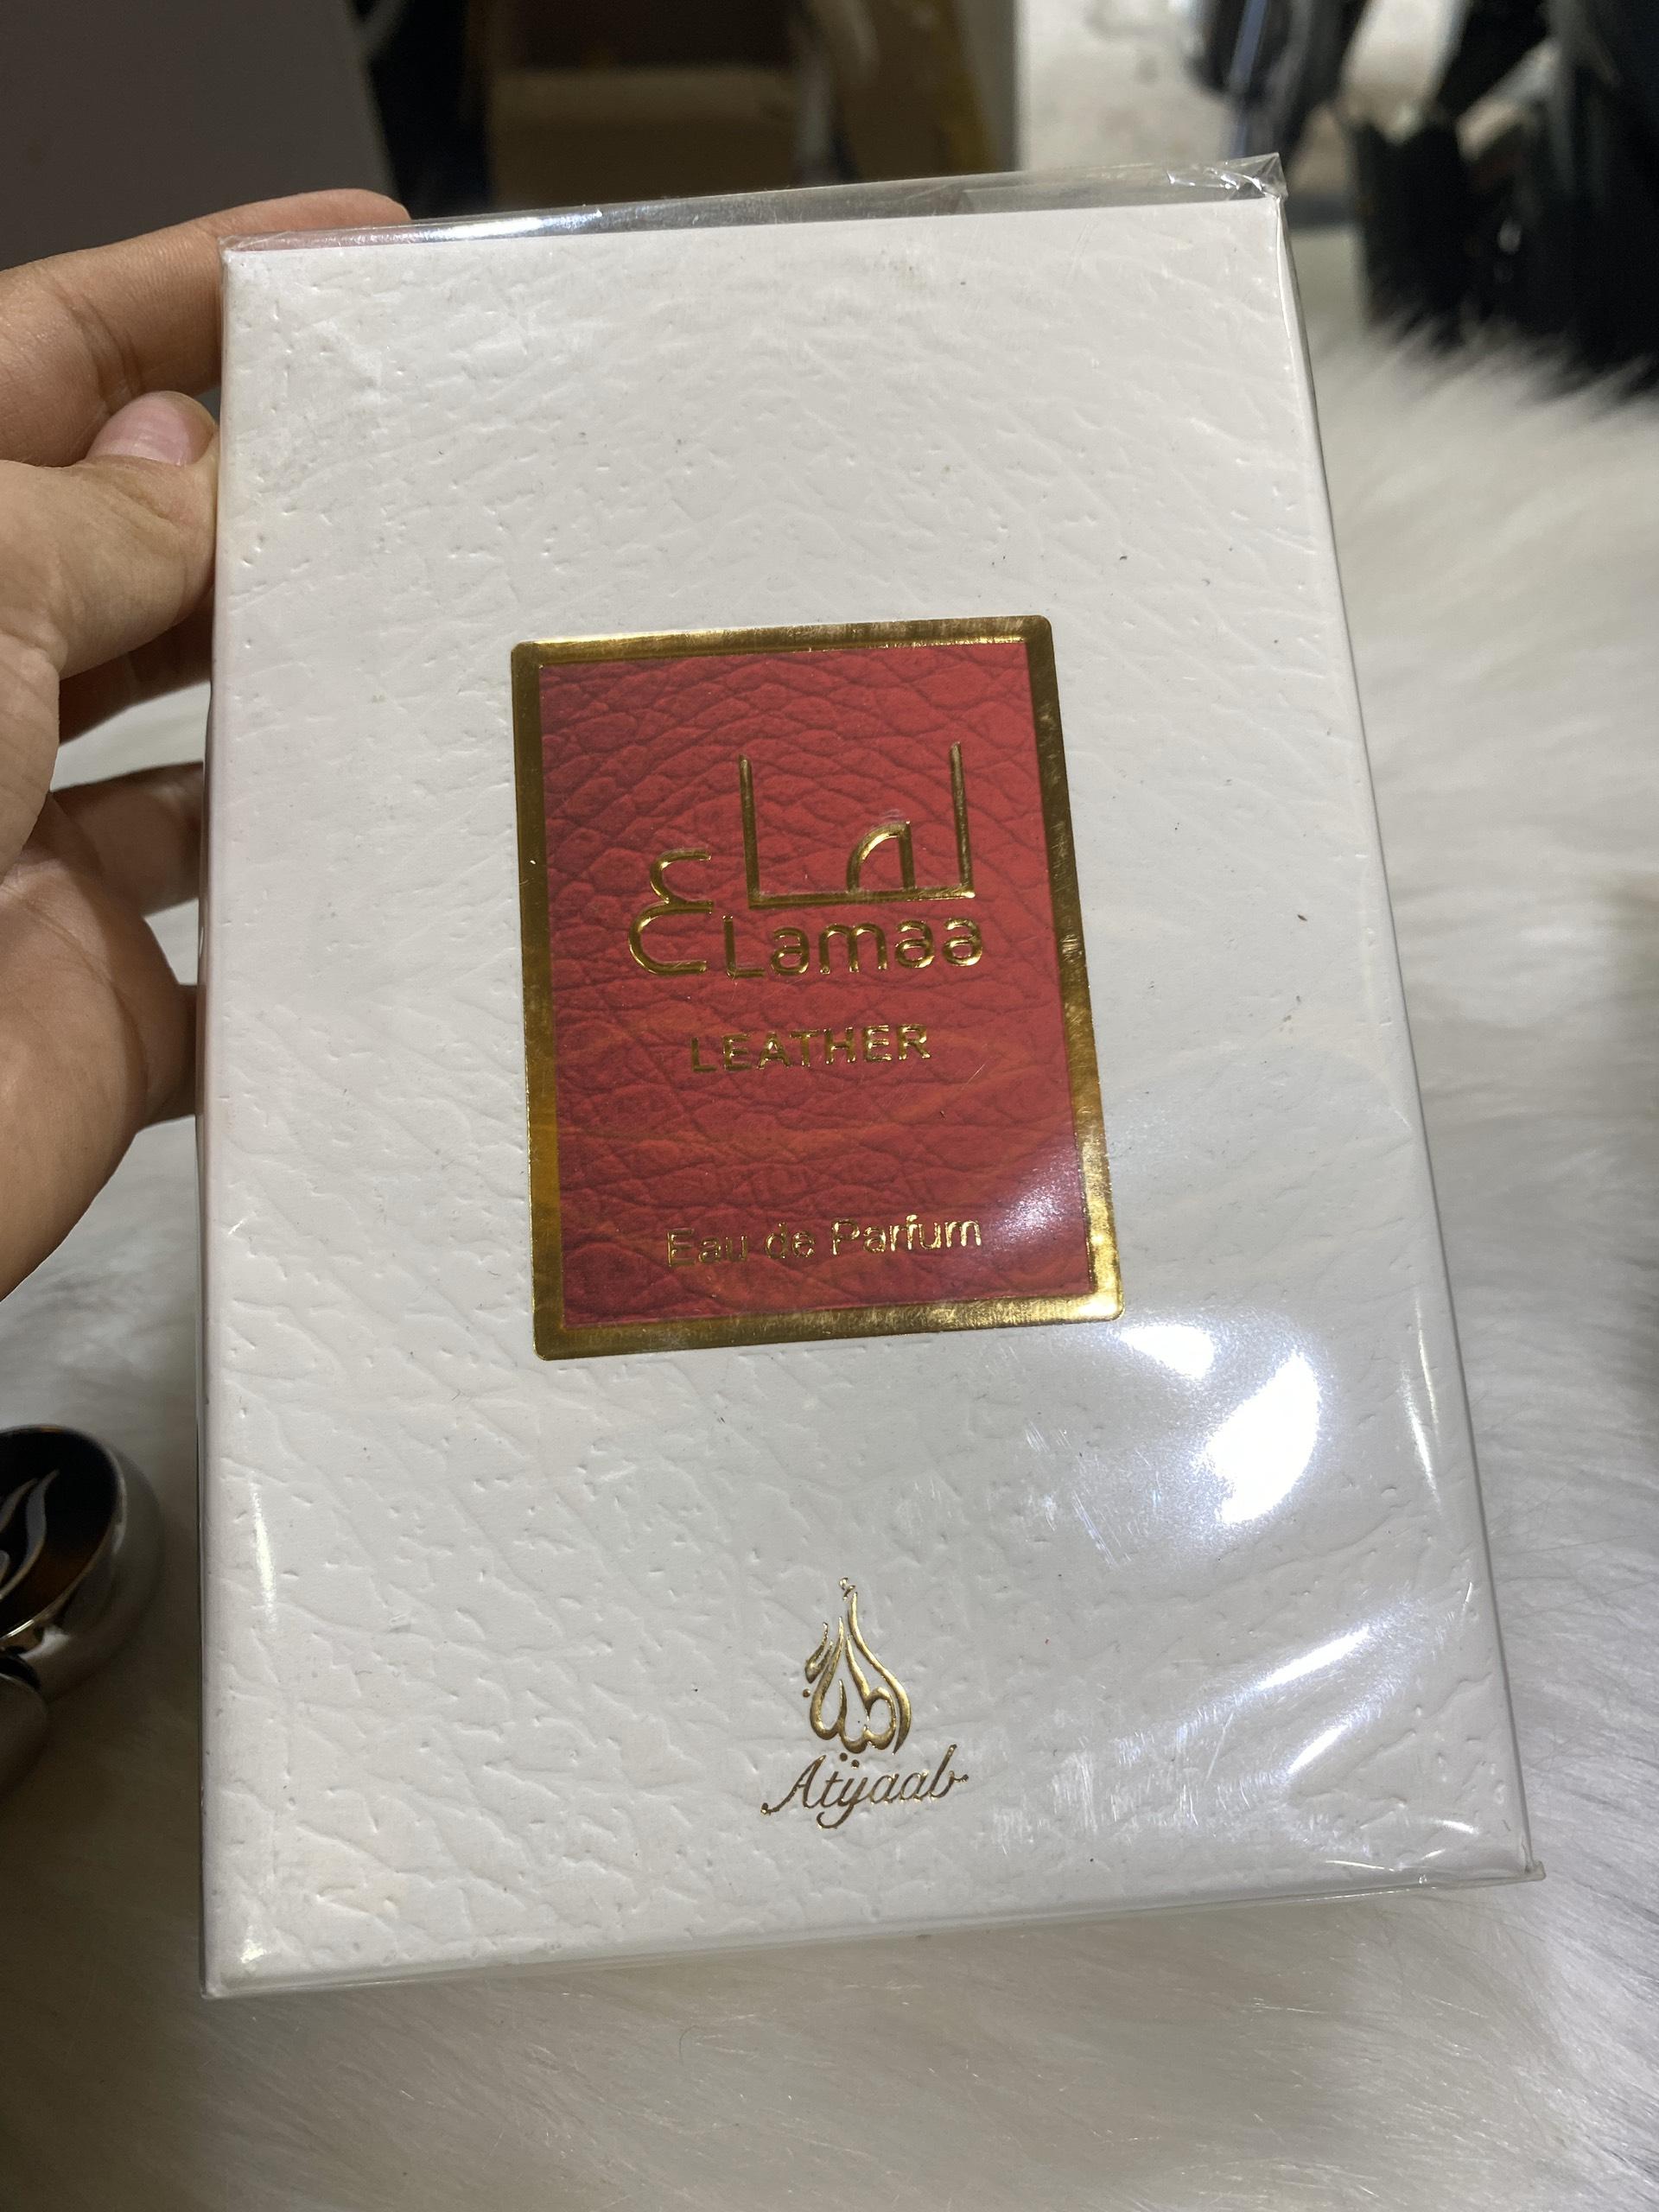 nuoc-hoa-lamaa-leather.jpg